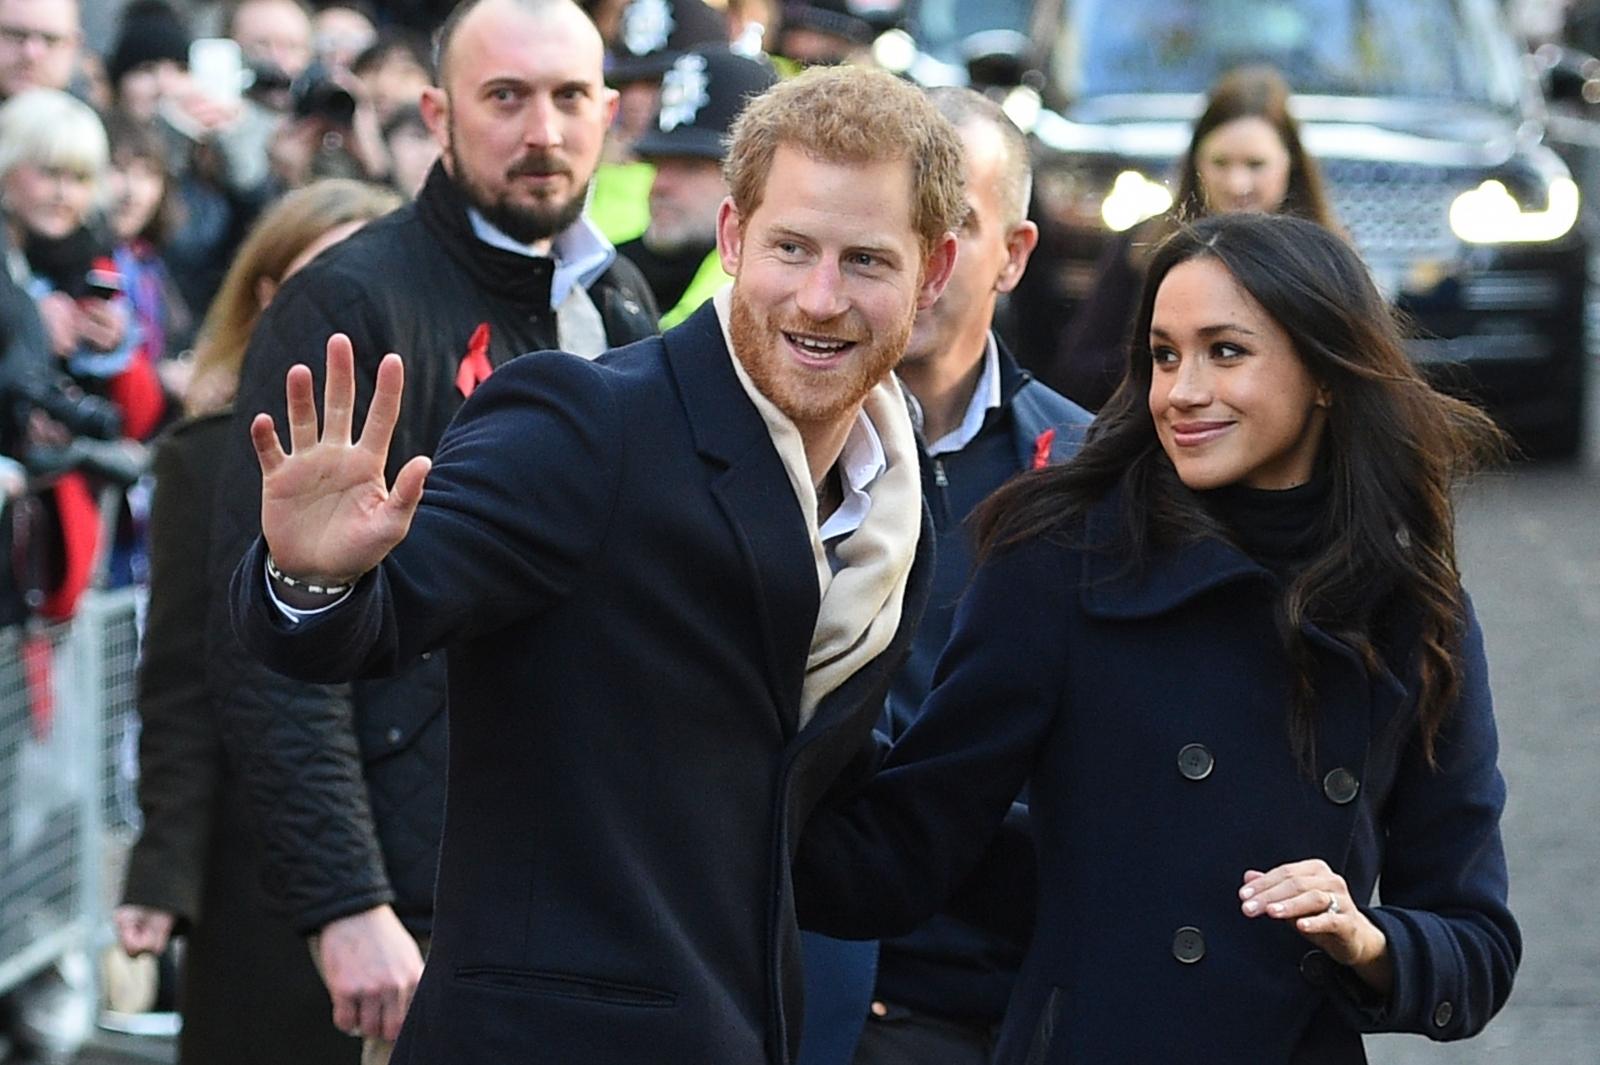 Prince Harry and Meghan Markle's wedding day 'menu' revealed